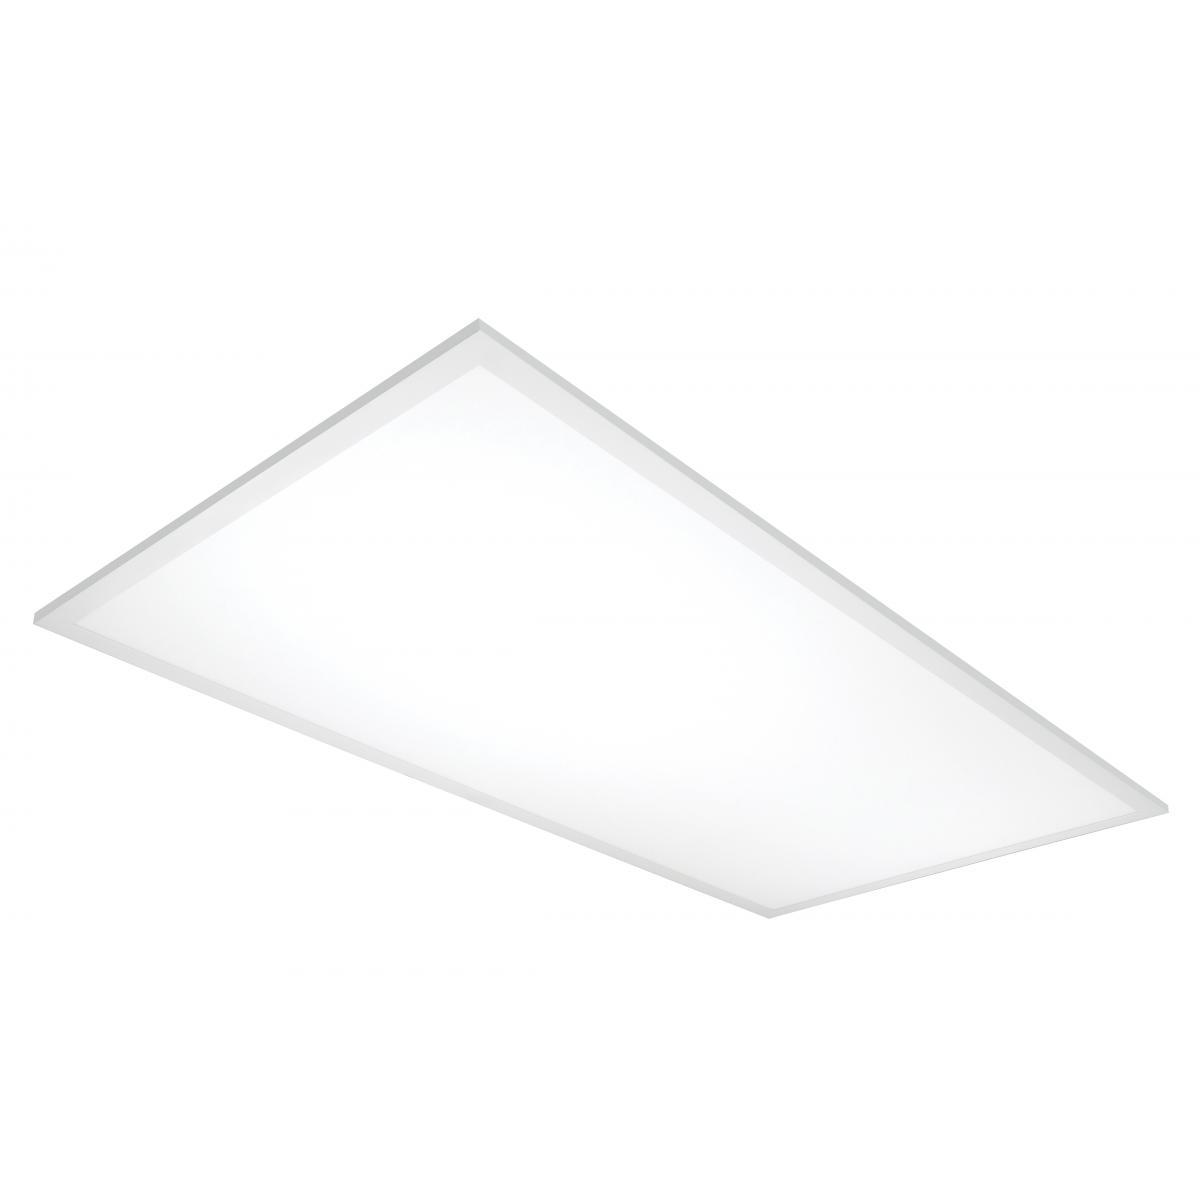 65-318 2FT X 4FT LED FLAT PANEL 48W